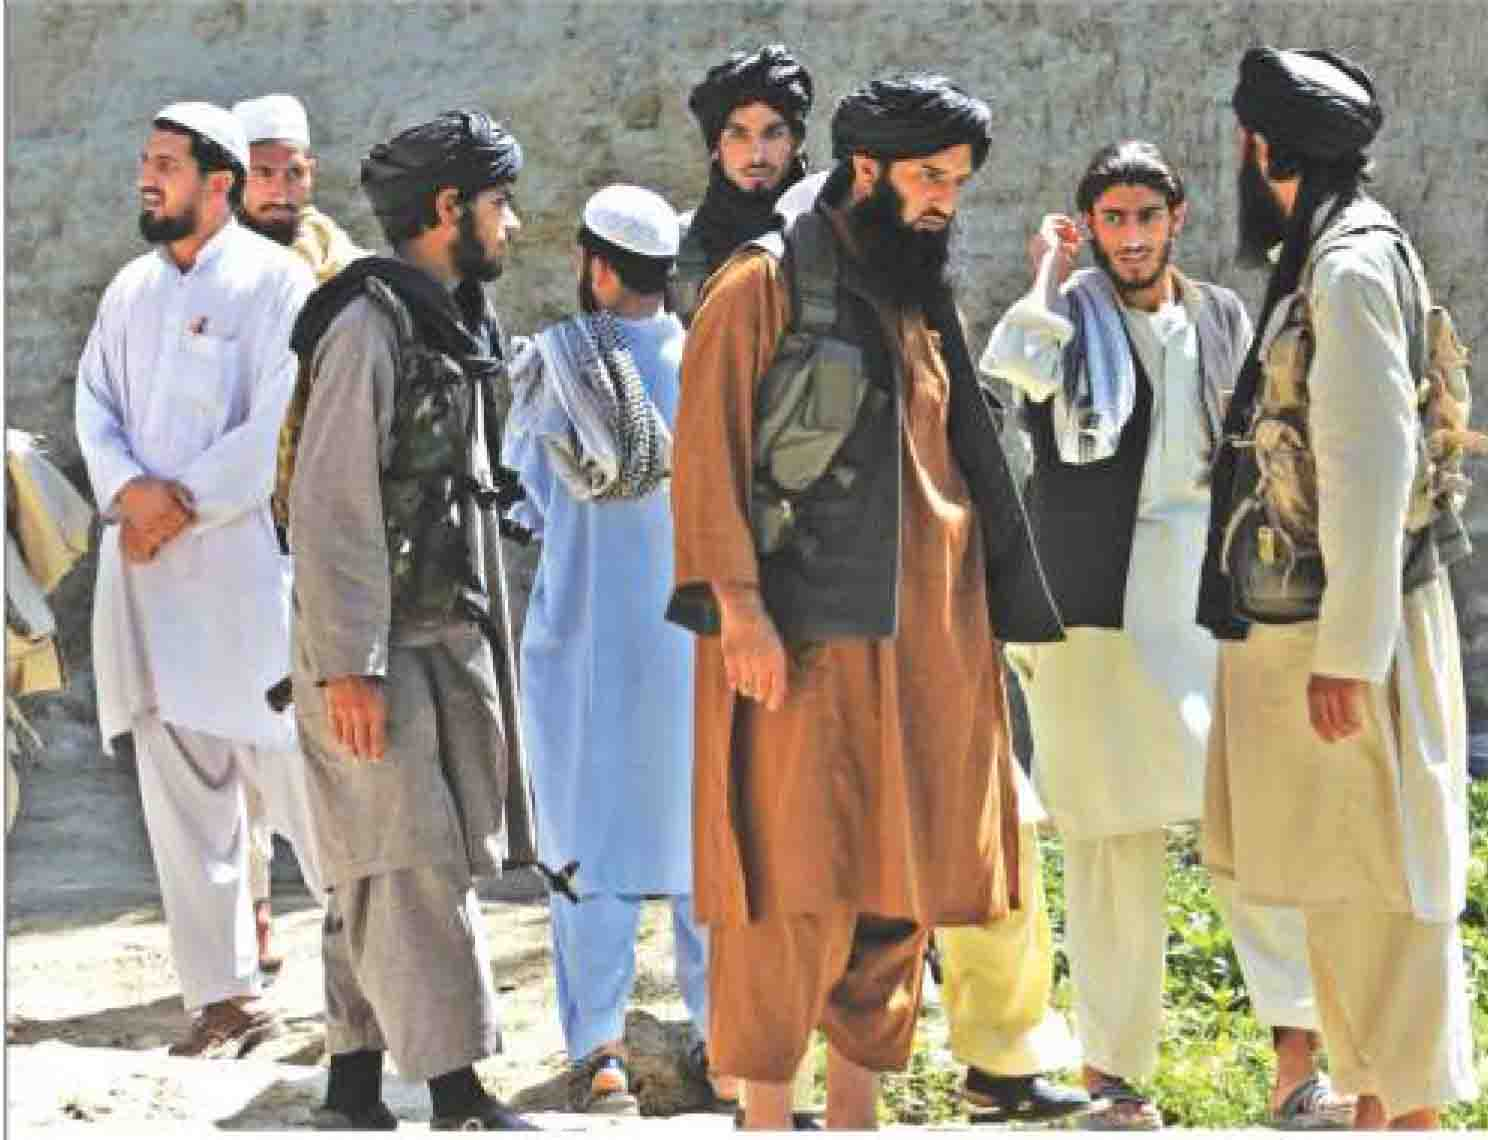 Taliban fighters have sanctuaries in border areas between Pak & Afganistan